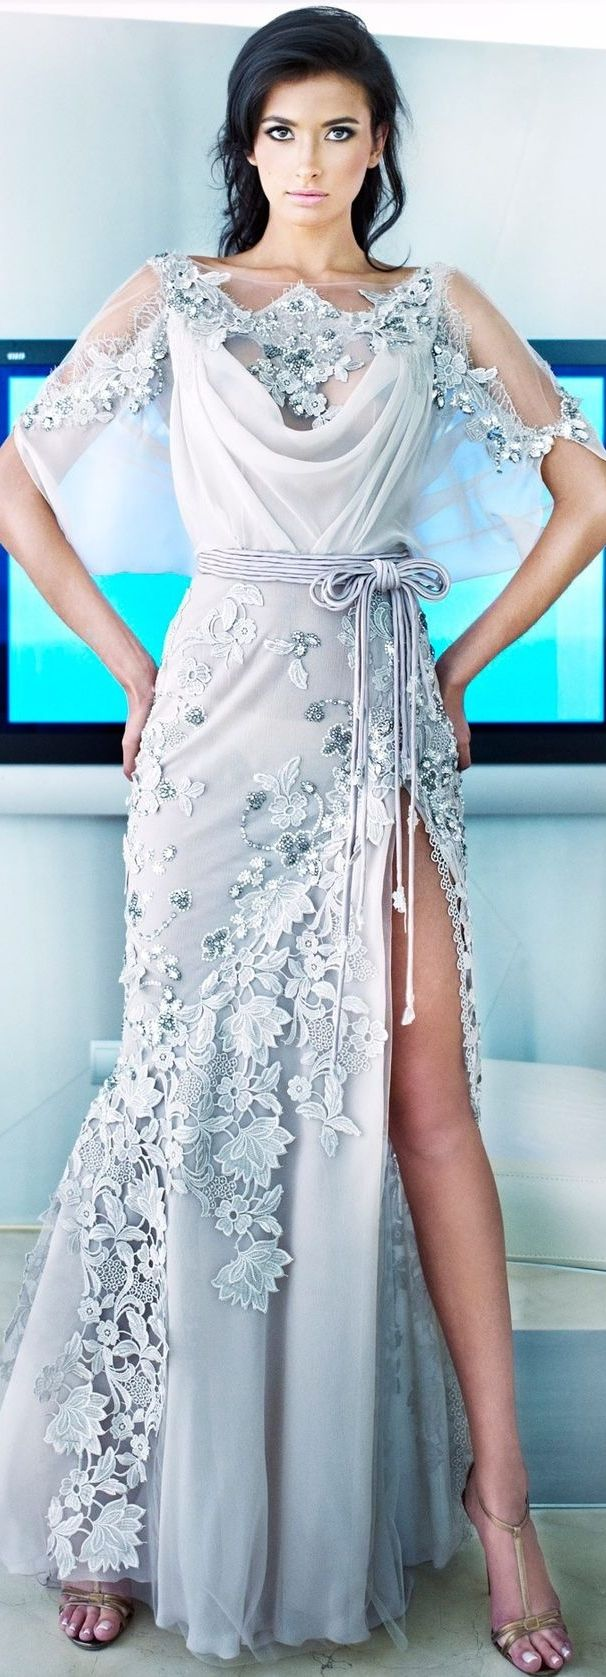 The dress is so Celeste